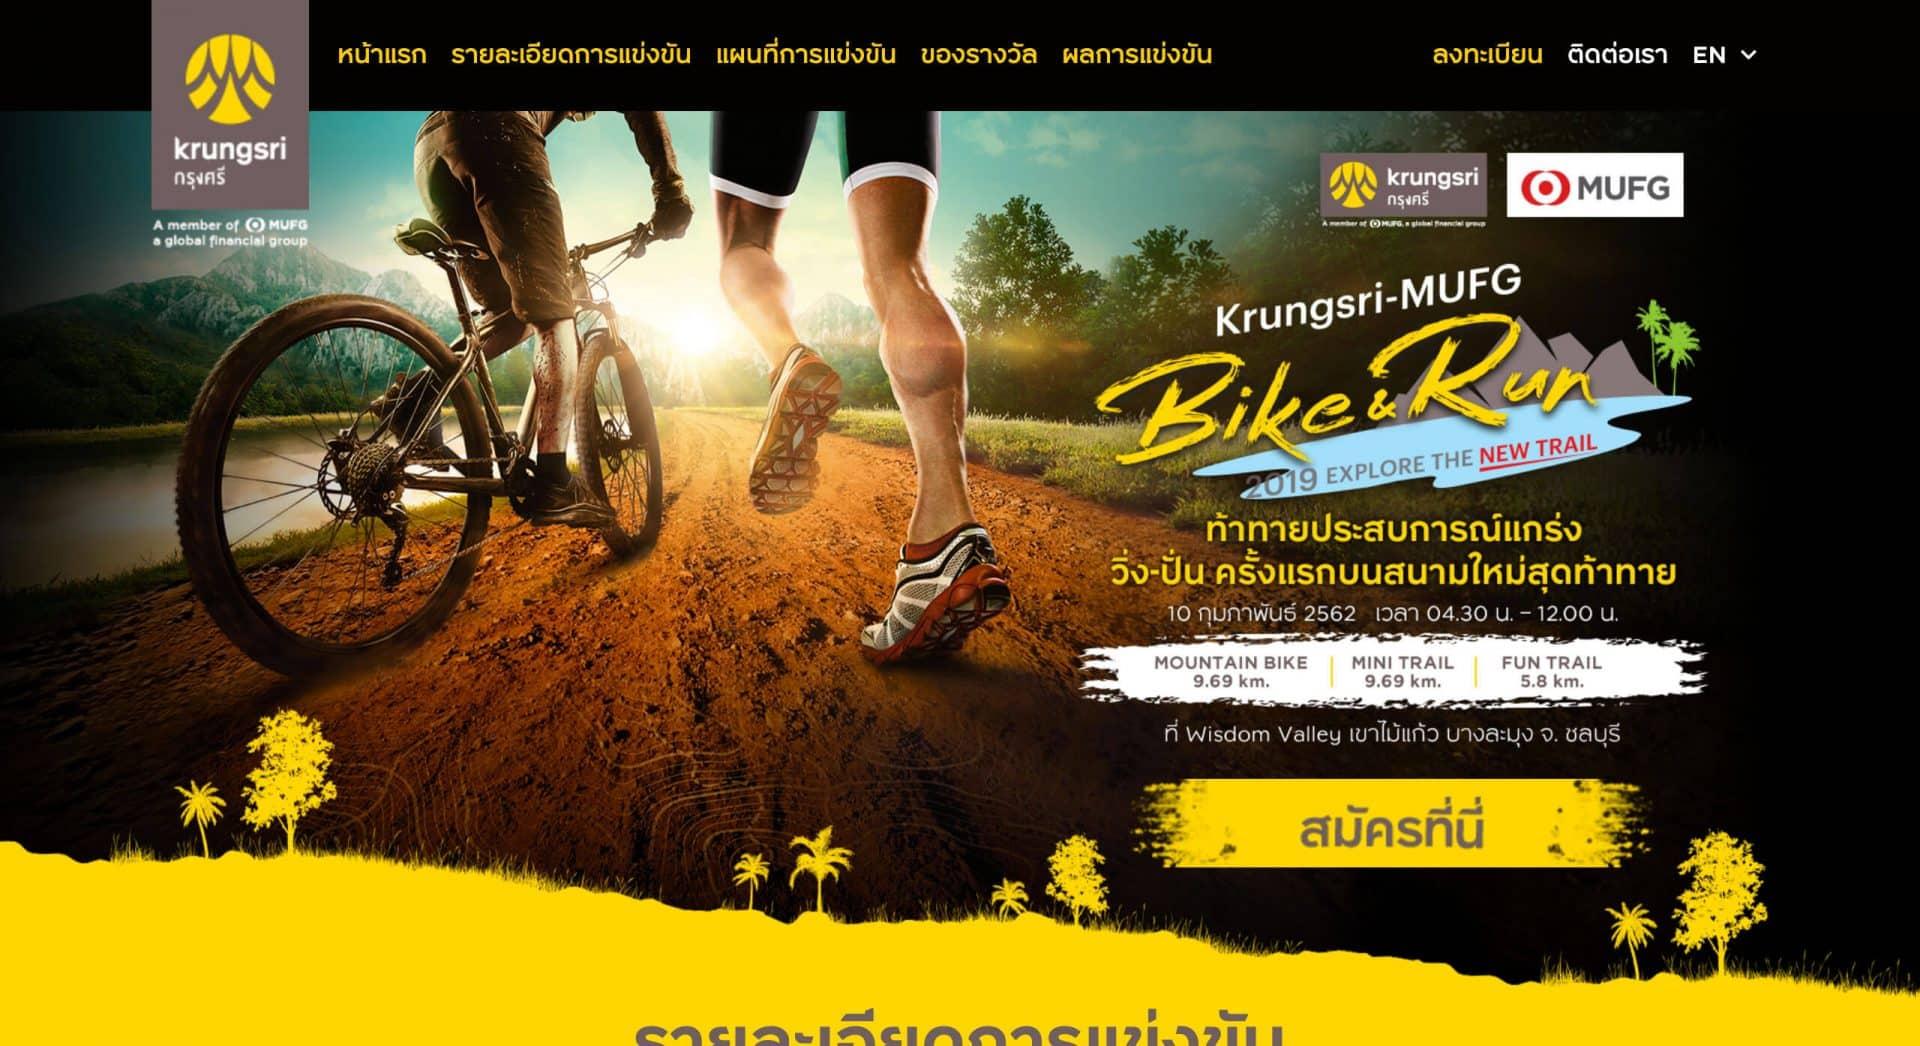 Krungsri Bike and Run